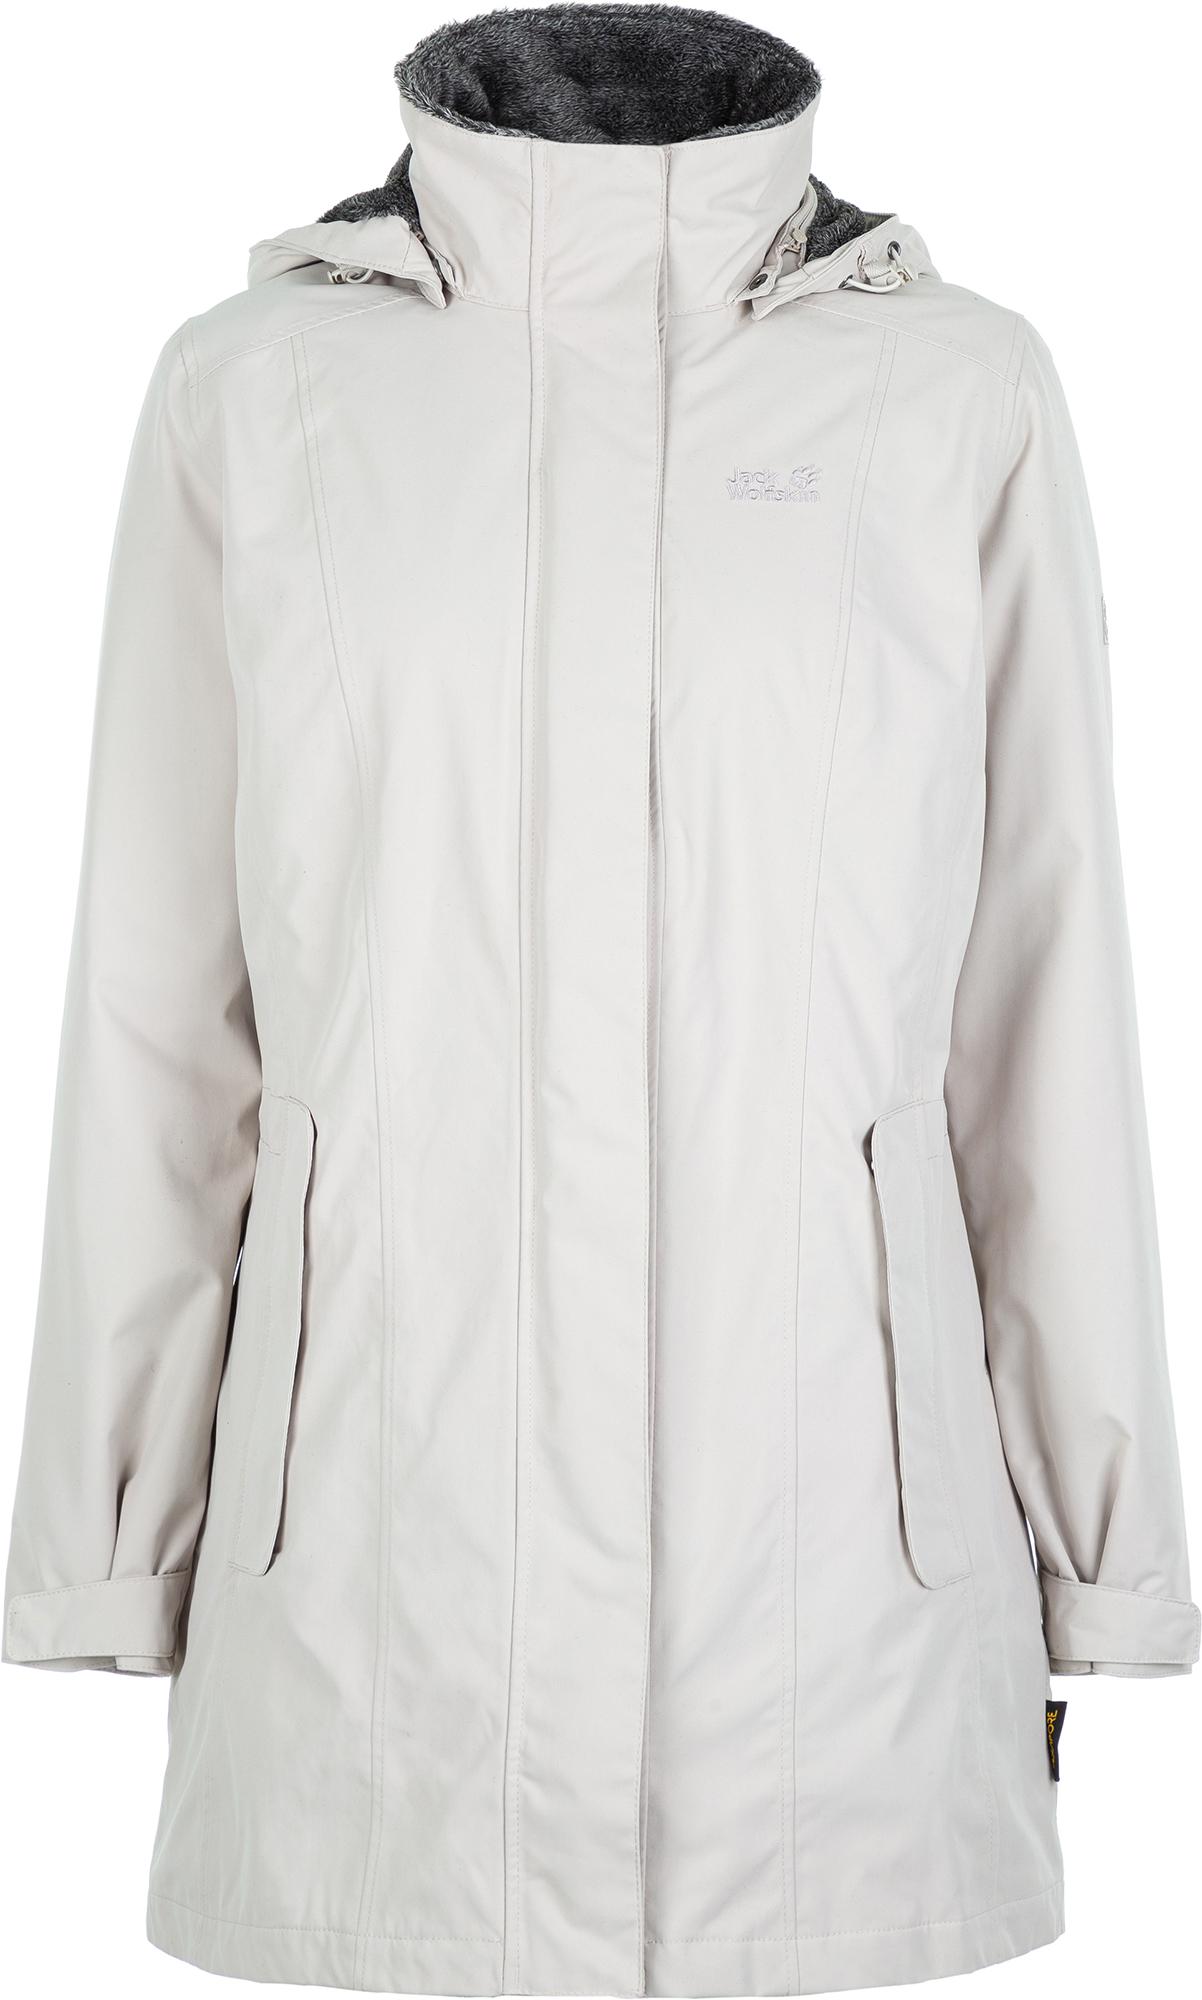 Jack Wolfskin Куртка утепленная женская Madison Avenue, размер 52-54